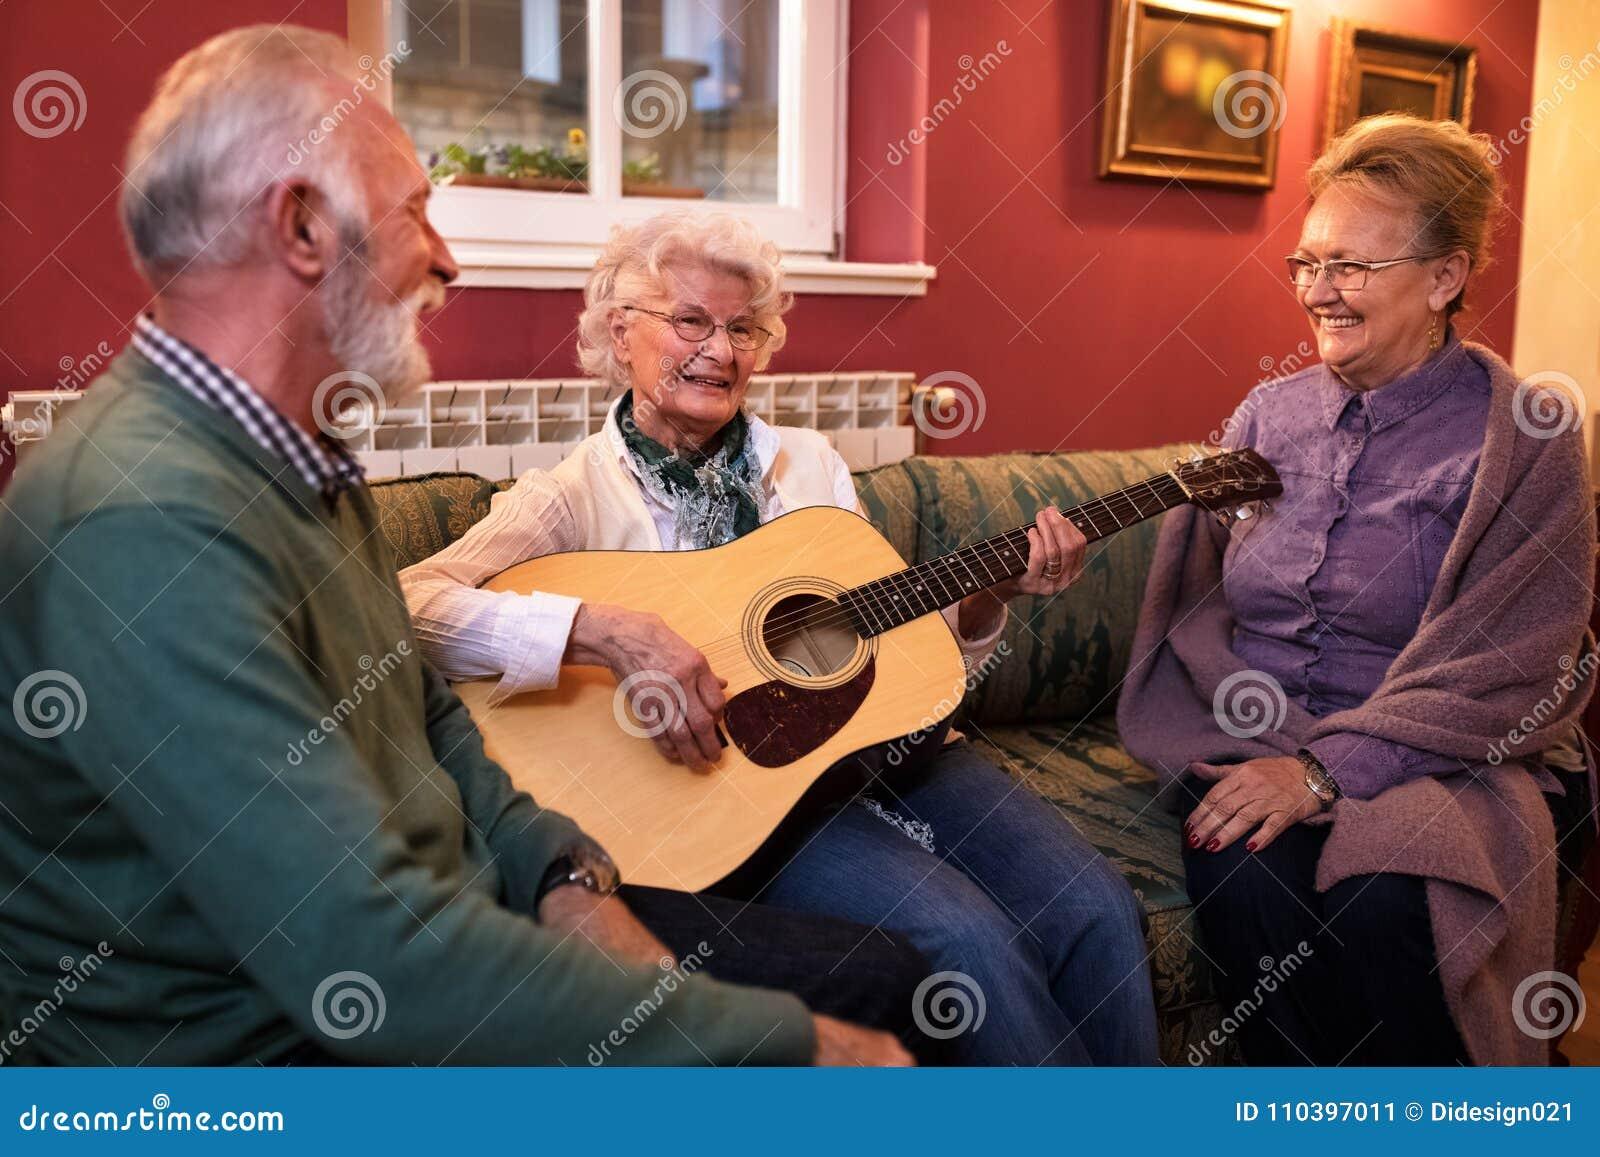 Gruppe ältere Leute genießen in der Freundschaft am Pflegeheim